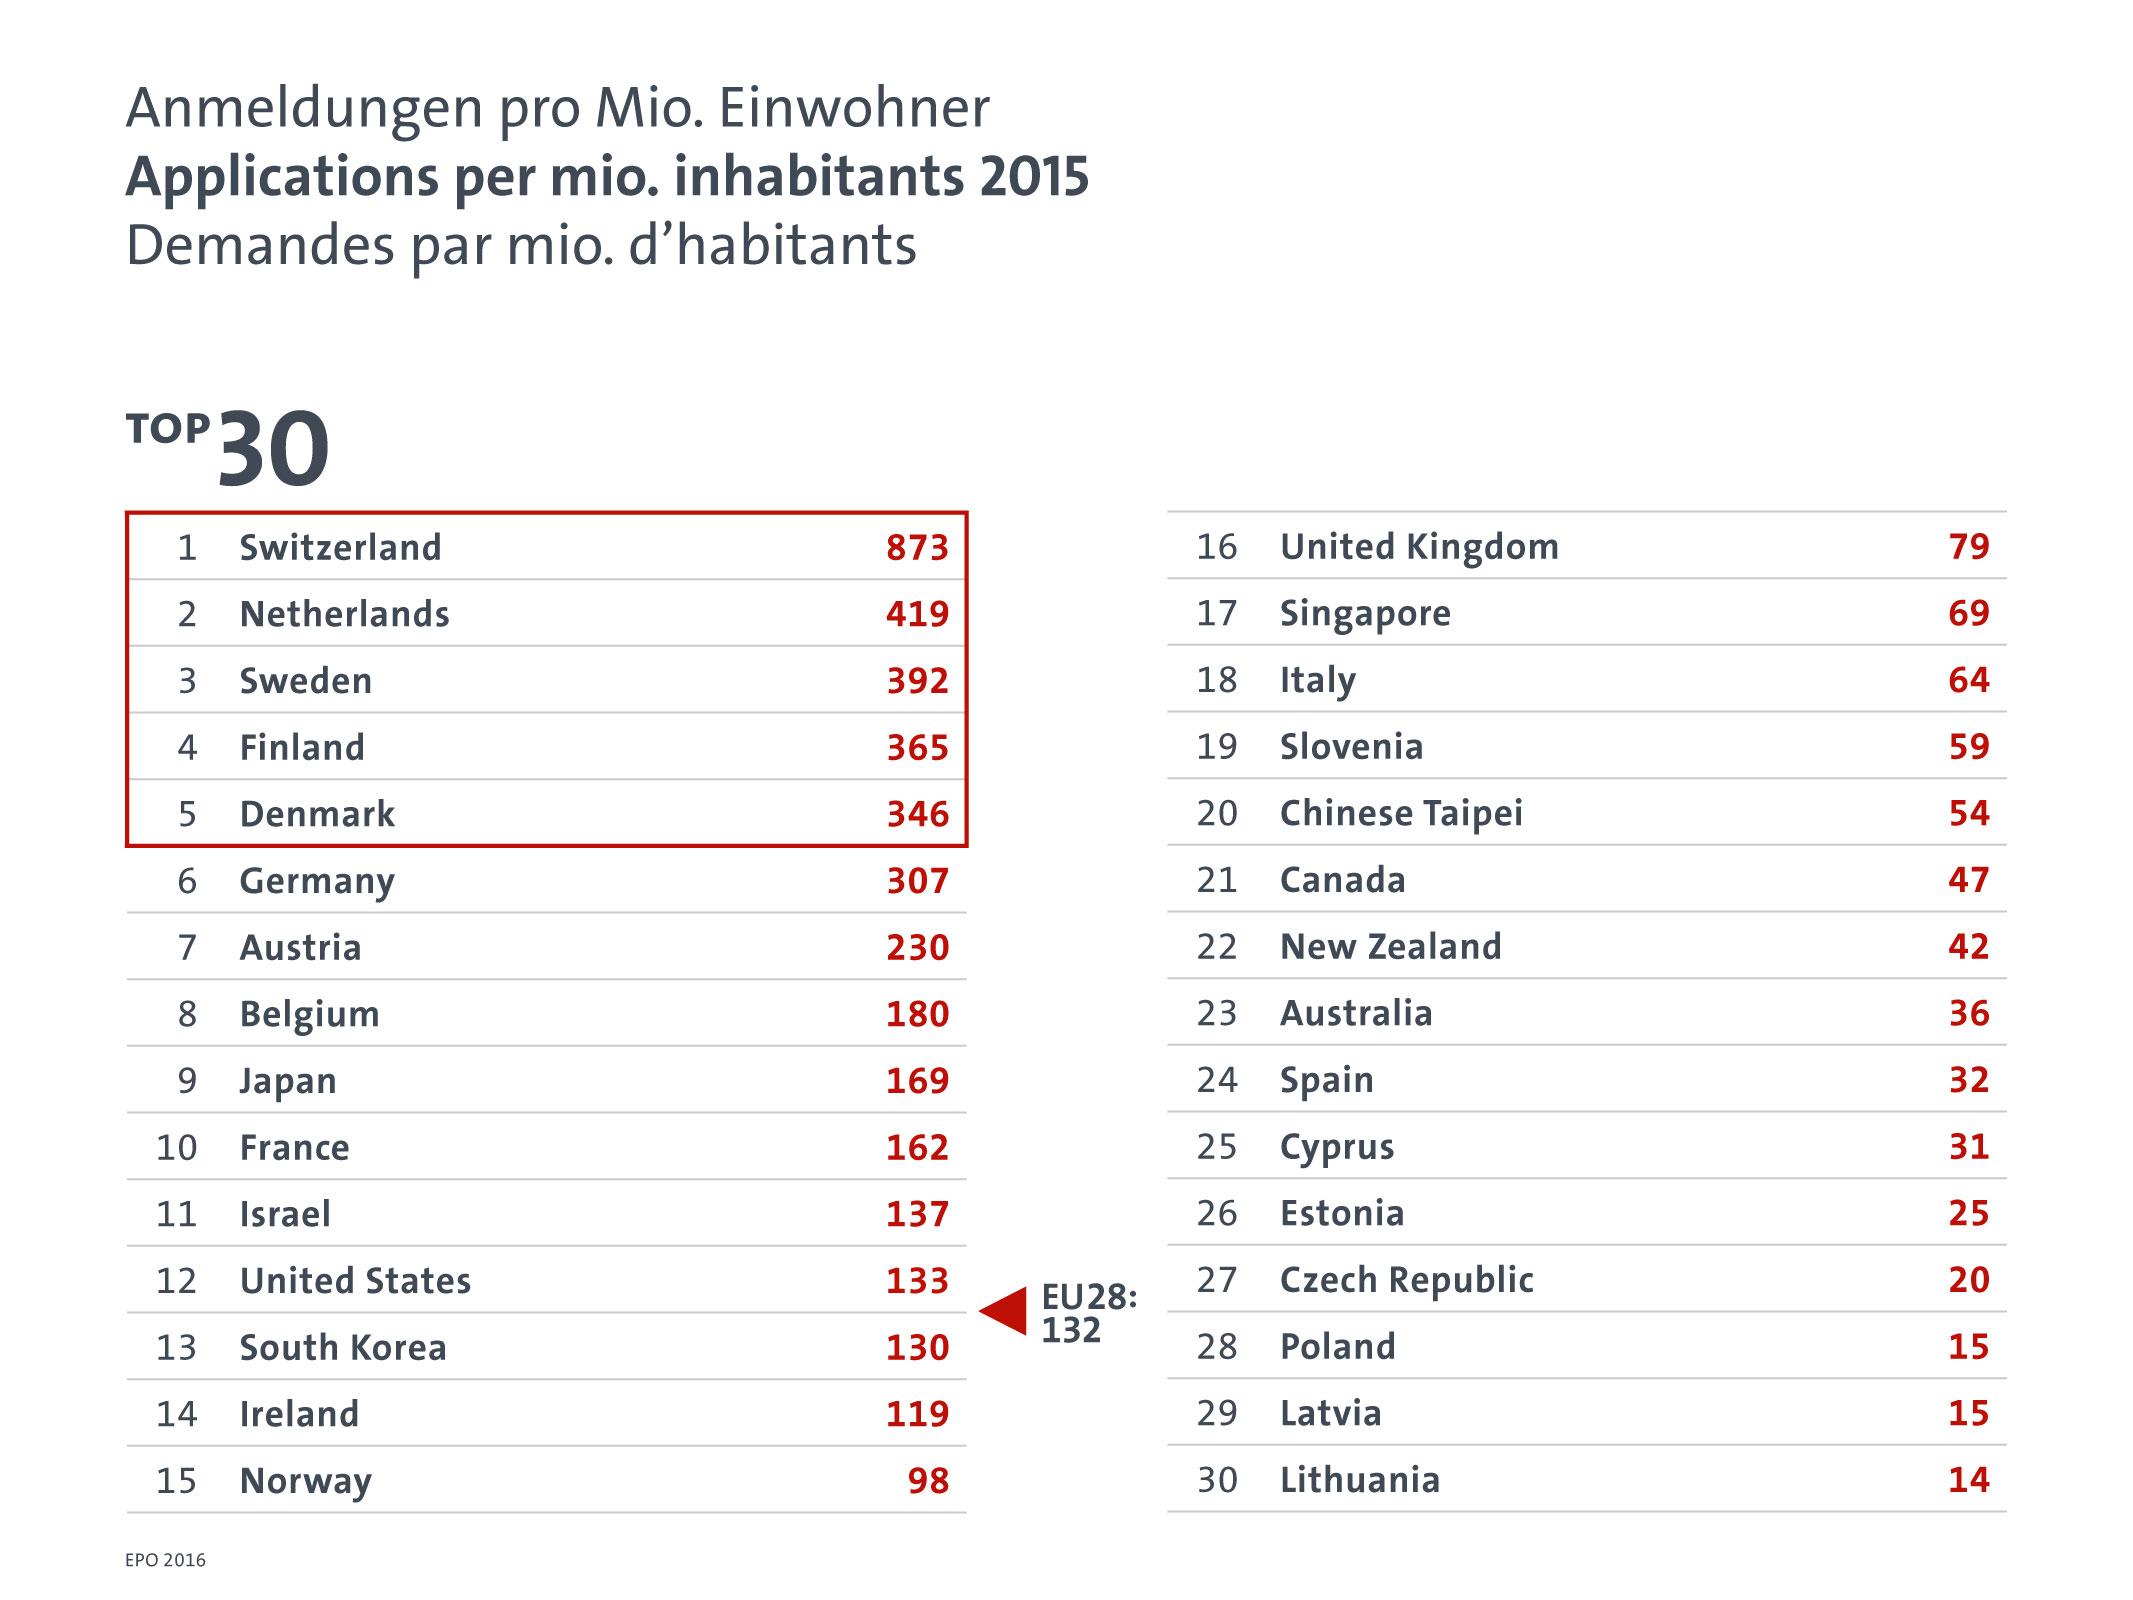 EPO annual results 2015: Applications per mio. inhabitants